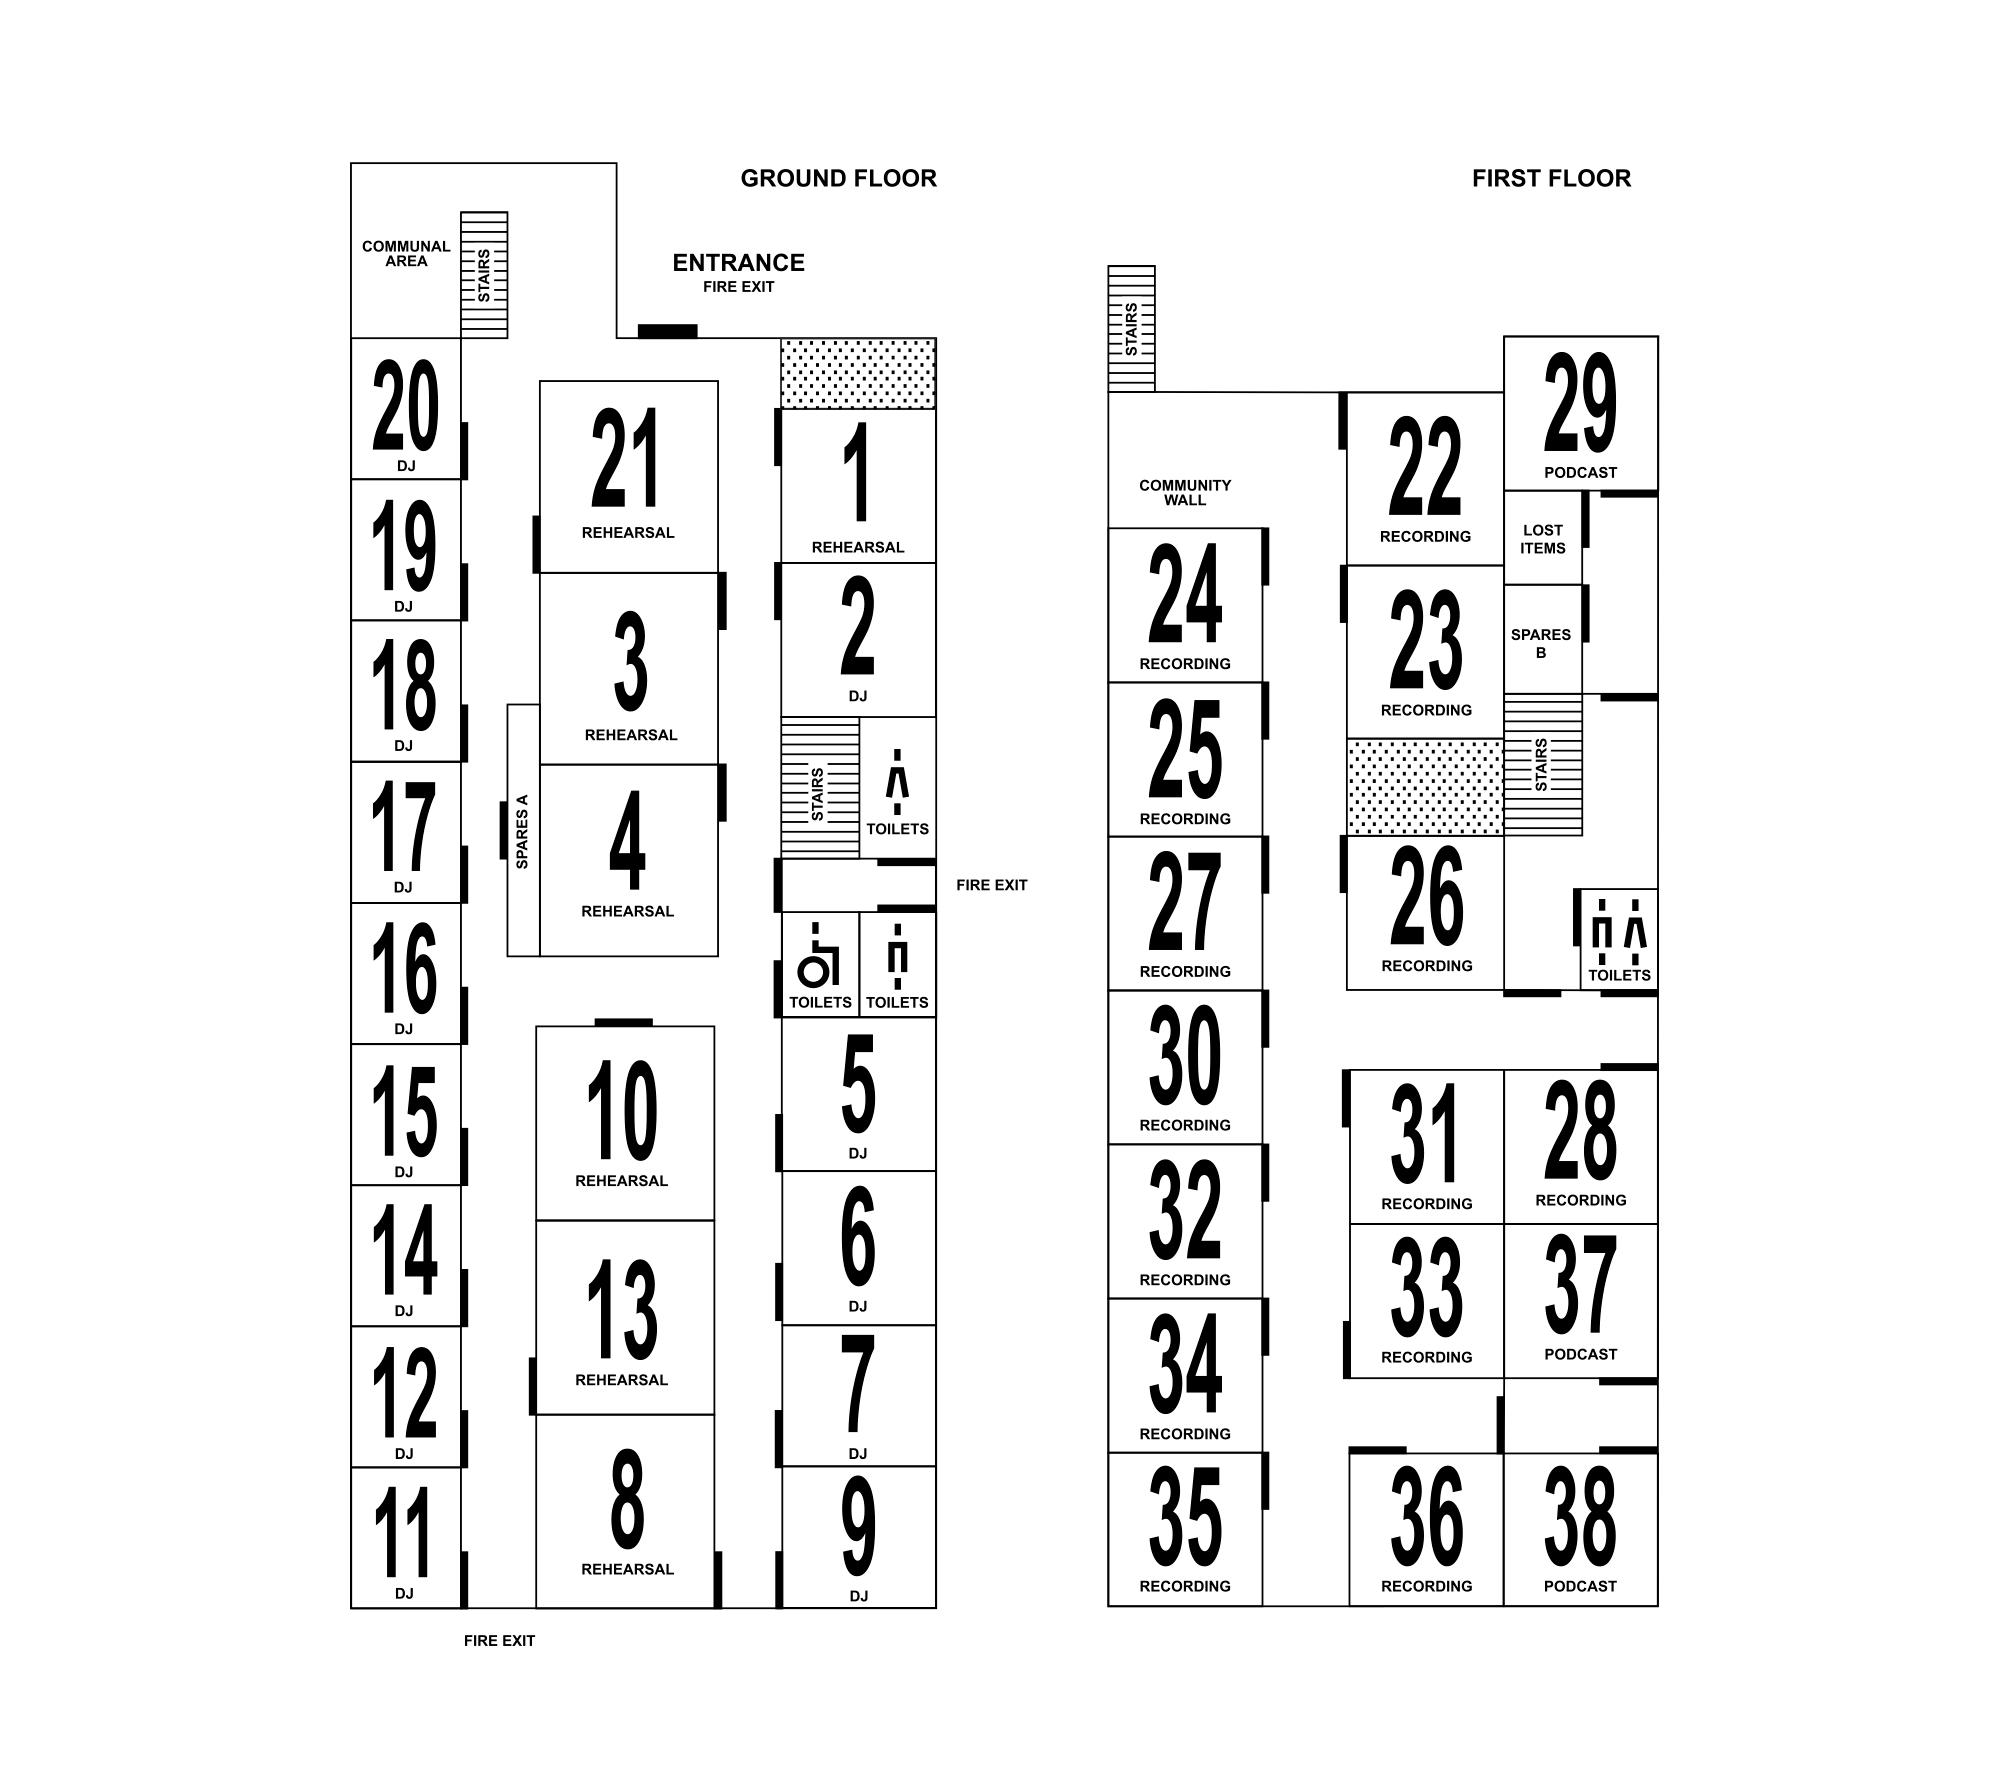 Floorplan: Ground and first floors